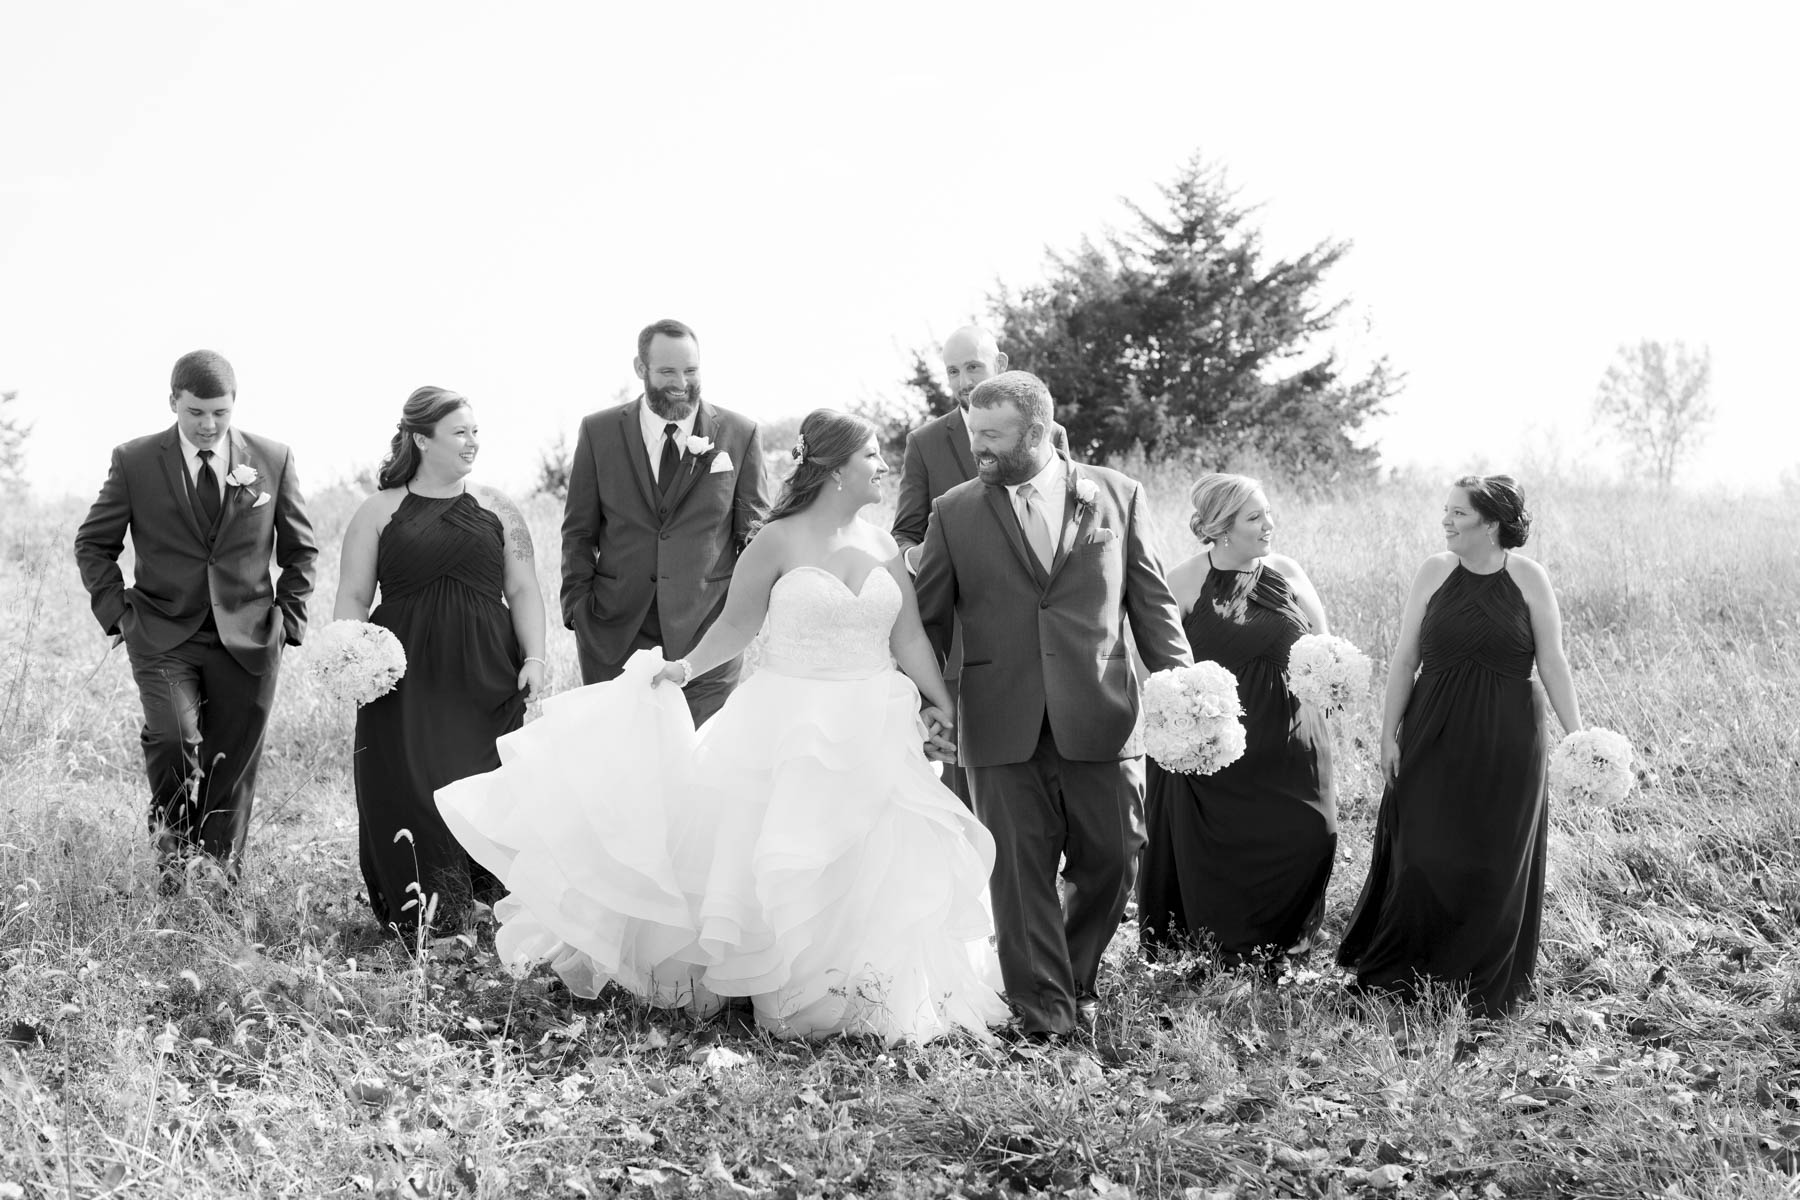 shotbychelsea_blog_wedding-23.jpg